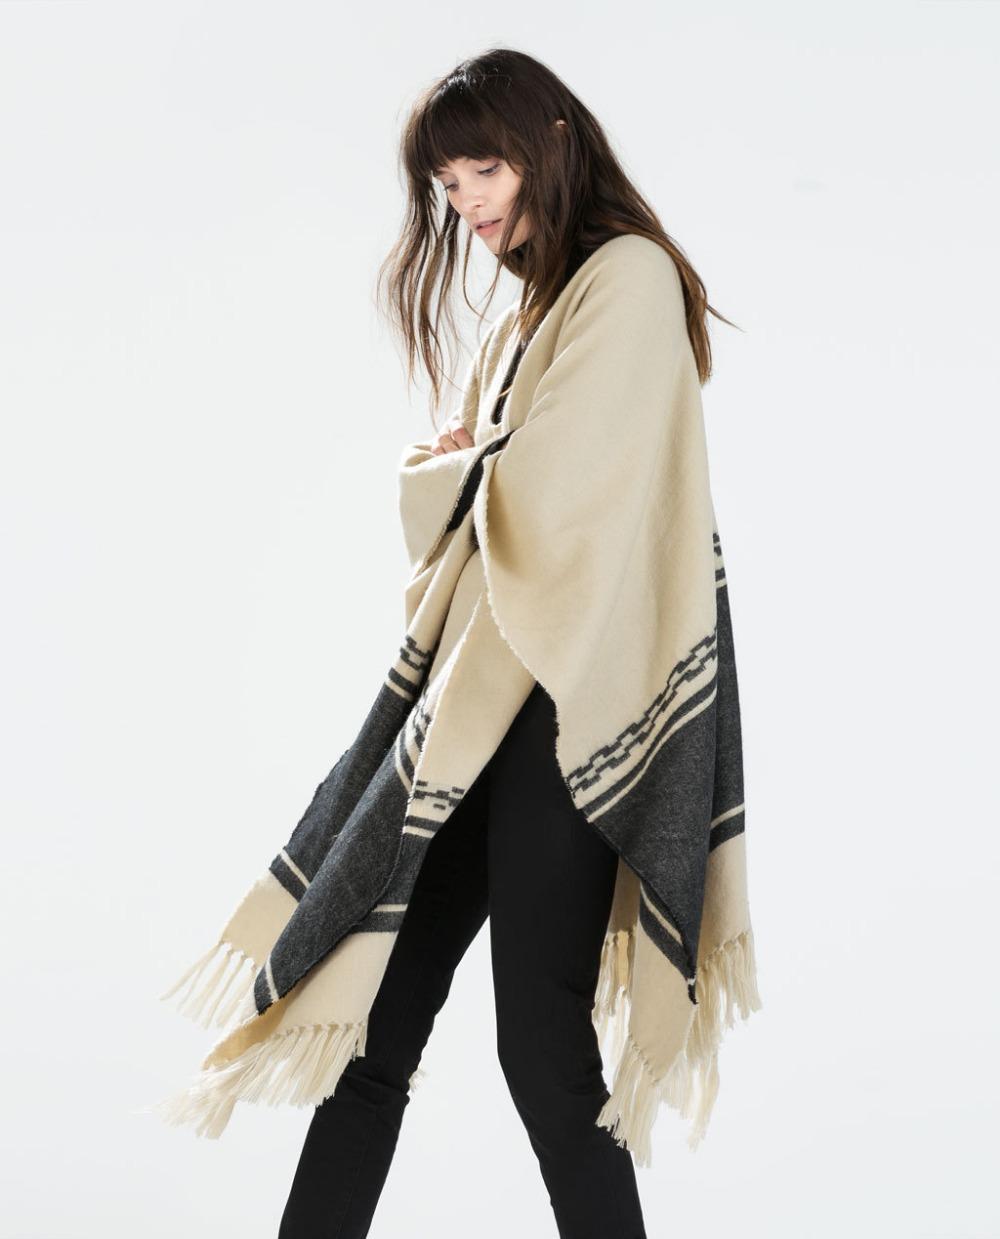 2014 New fashion brand za cashmere poncho with tassel designer blanket scarf high quality women winter warm shawl wraps HOT SELL(China (Mainland))